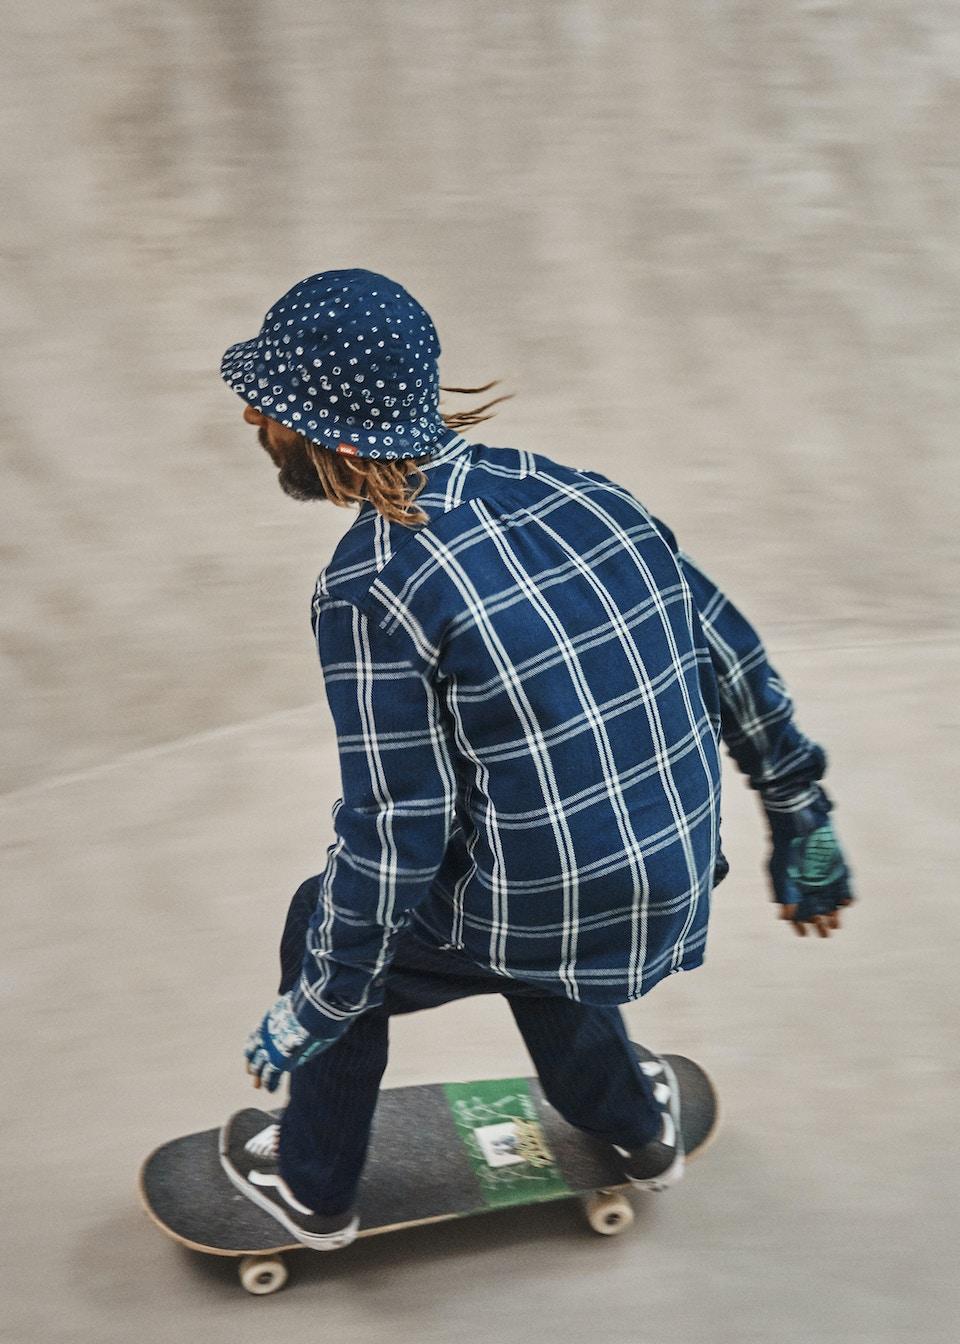 Legends x Vans Skateboarding